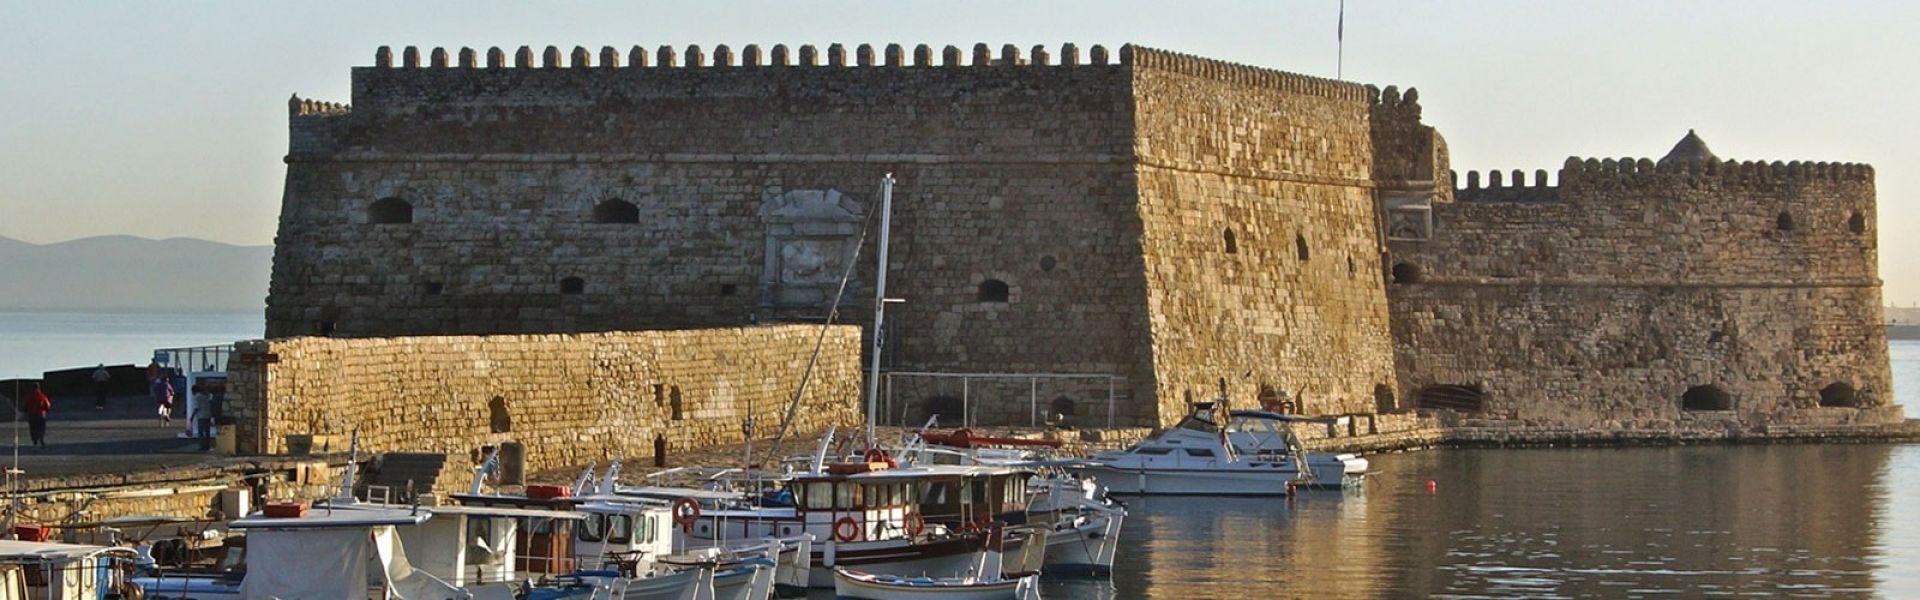 Venetian Fortress - Heraklion city